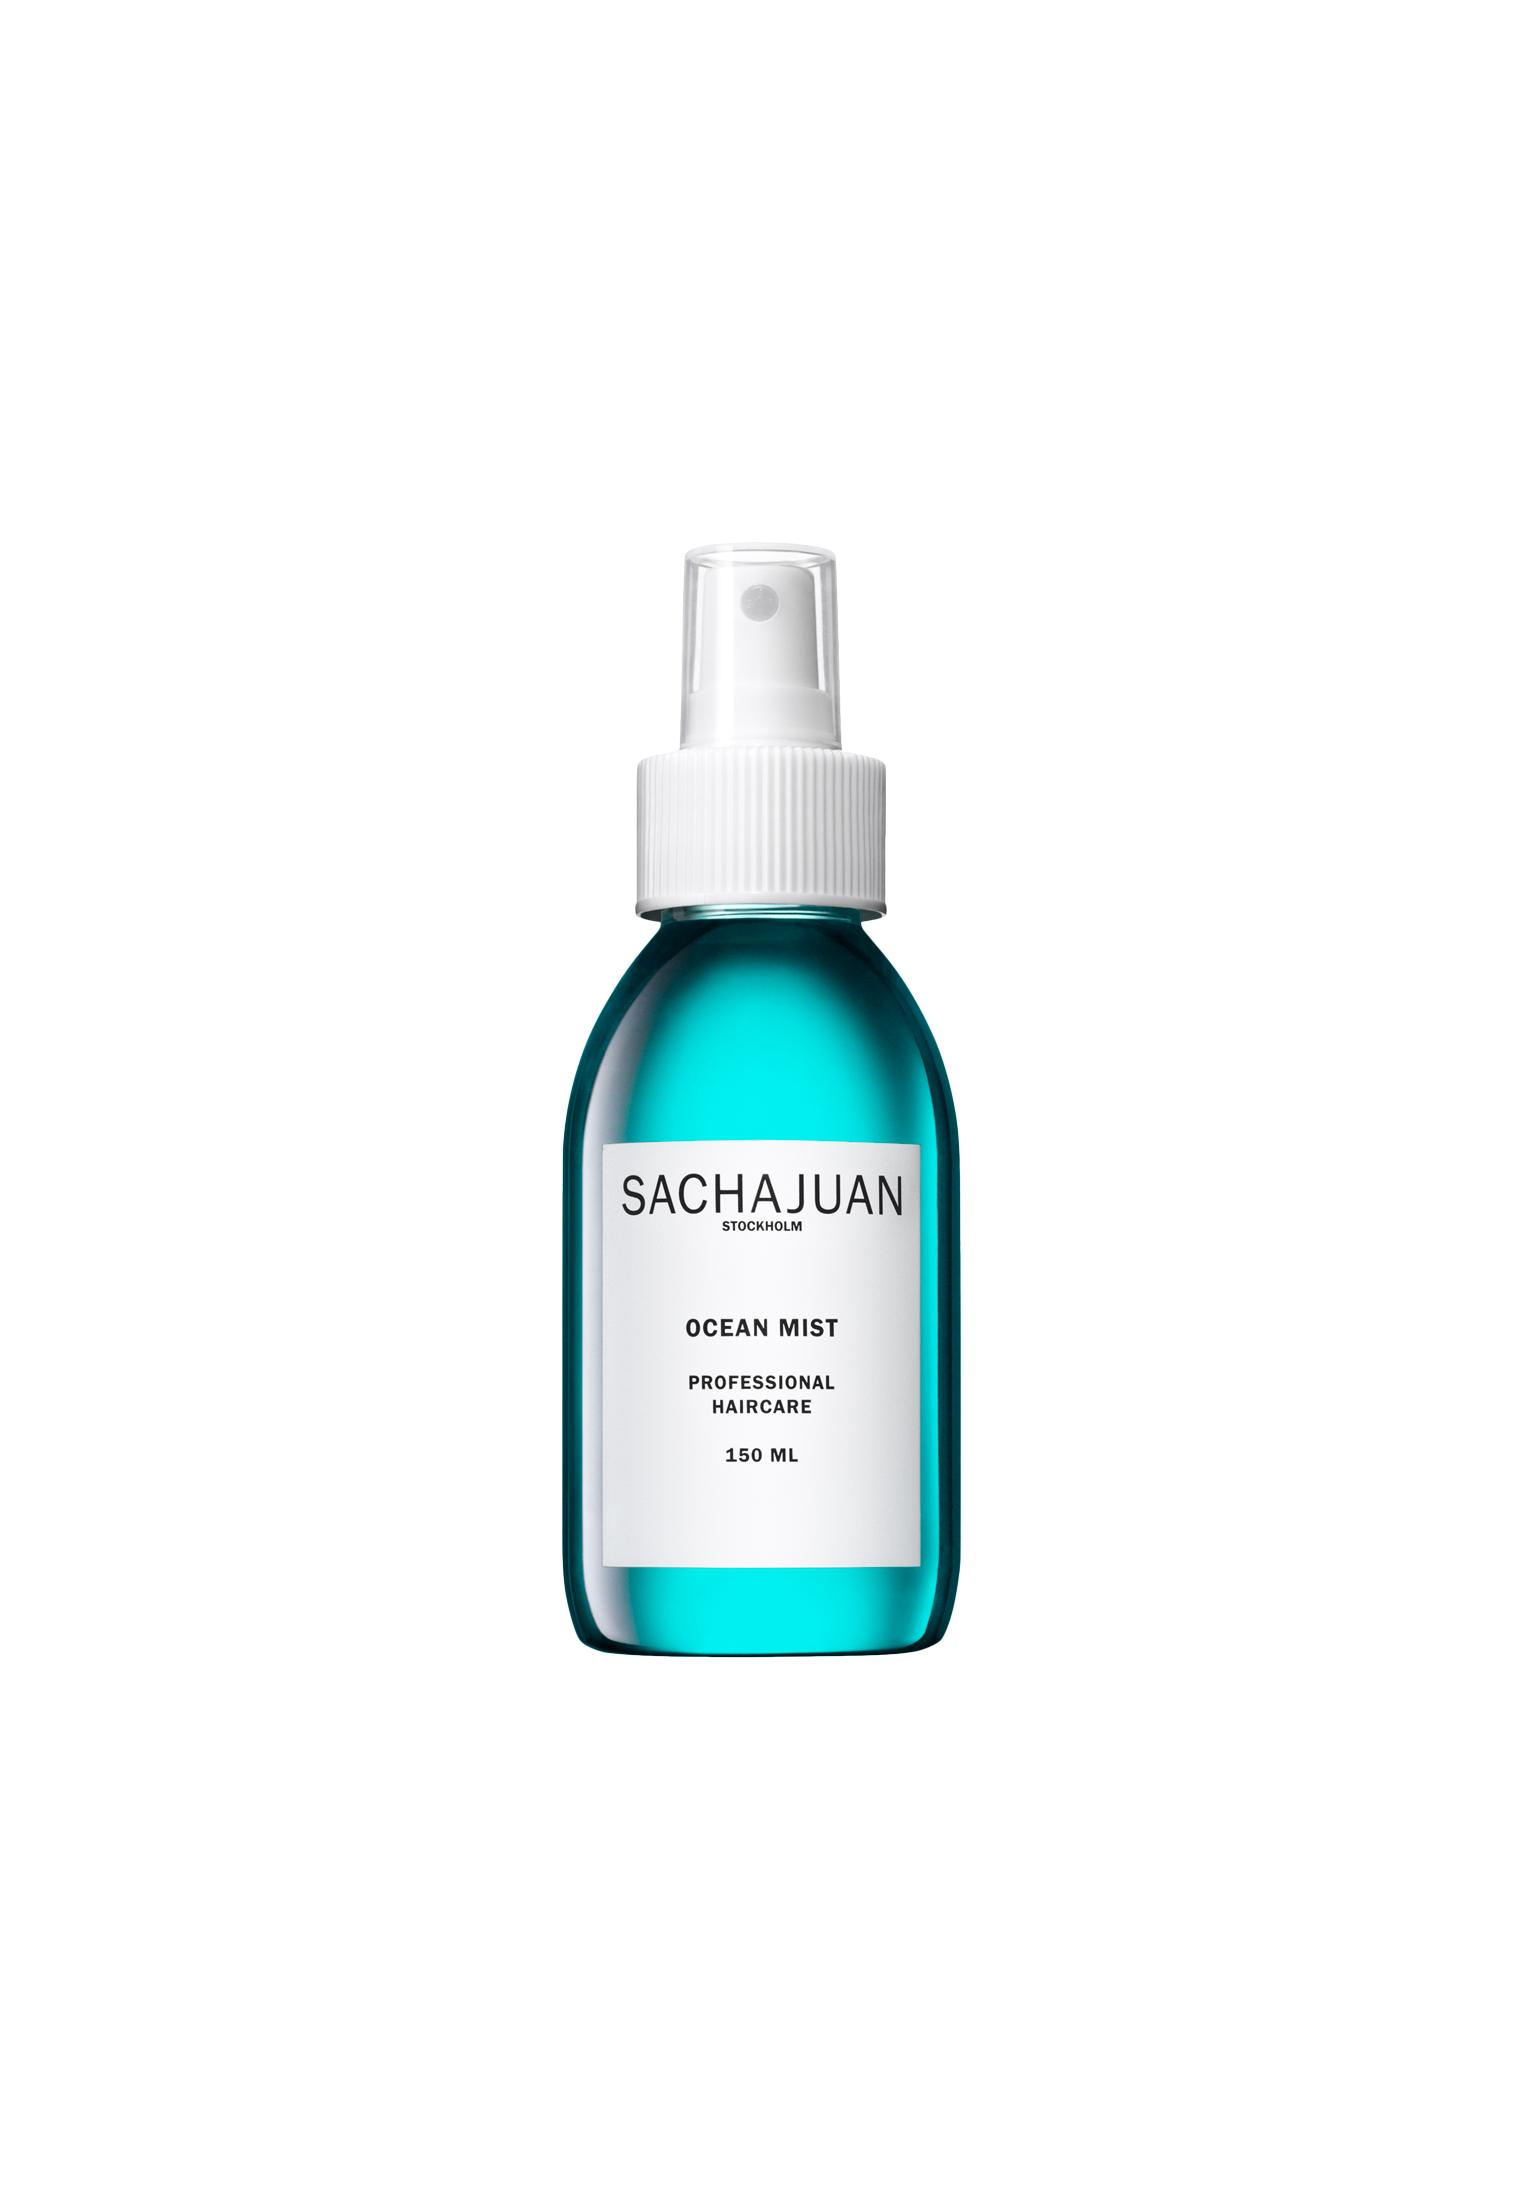 SACHAJUAN - Ocean Mist - 150 ml